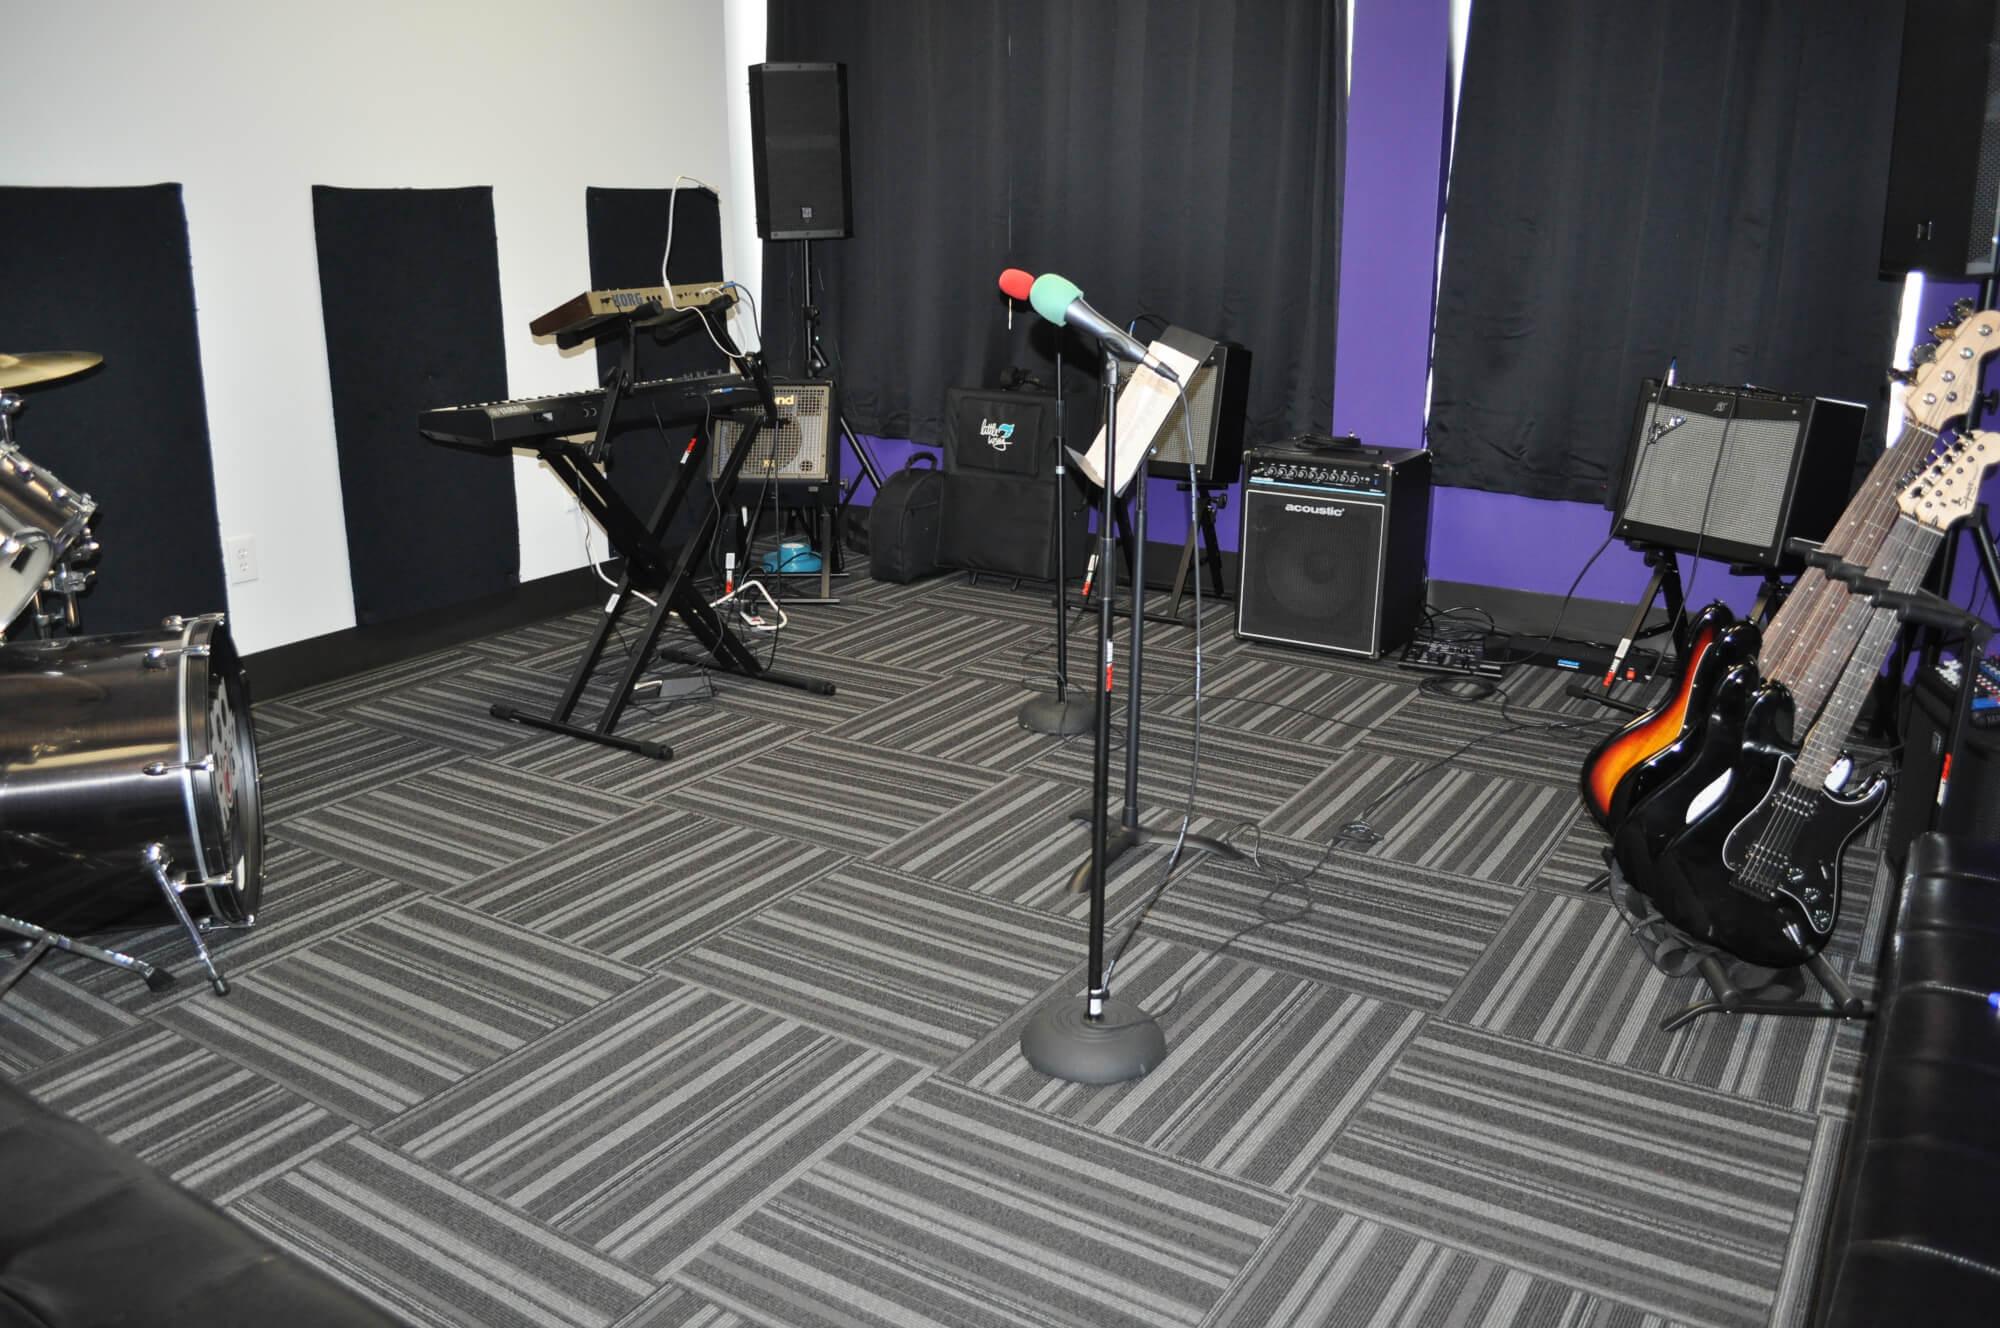 Professional grade studio and gear